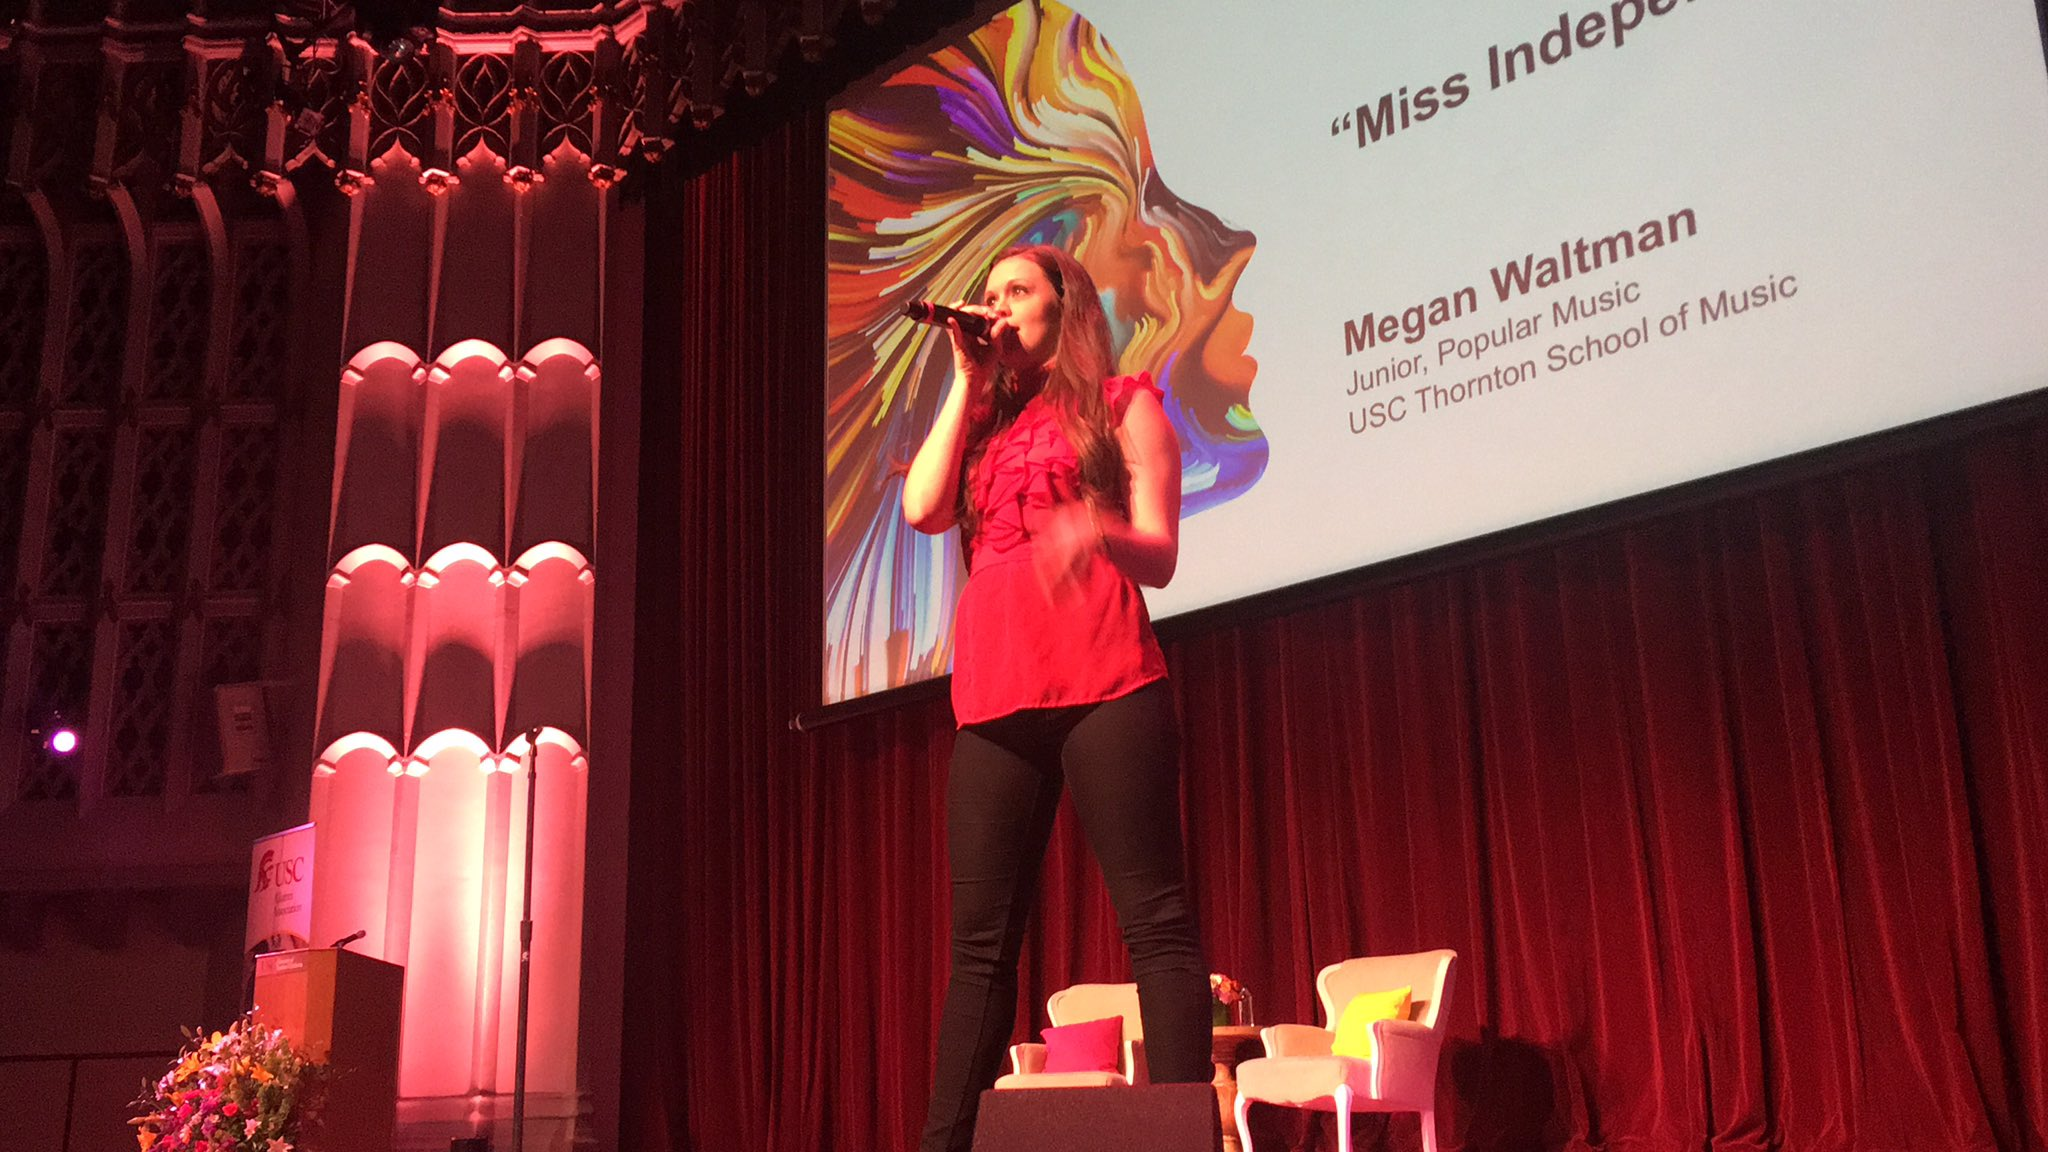 It's official, I want @USCThornton's Megan Waltman to be my karaoke partner. #USCWC https://t.co/FEHwdd8qWs